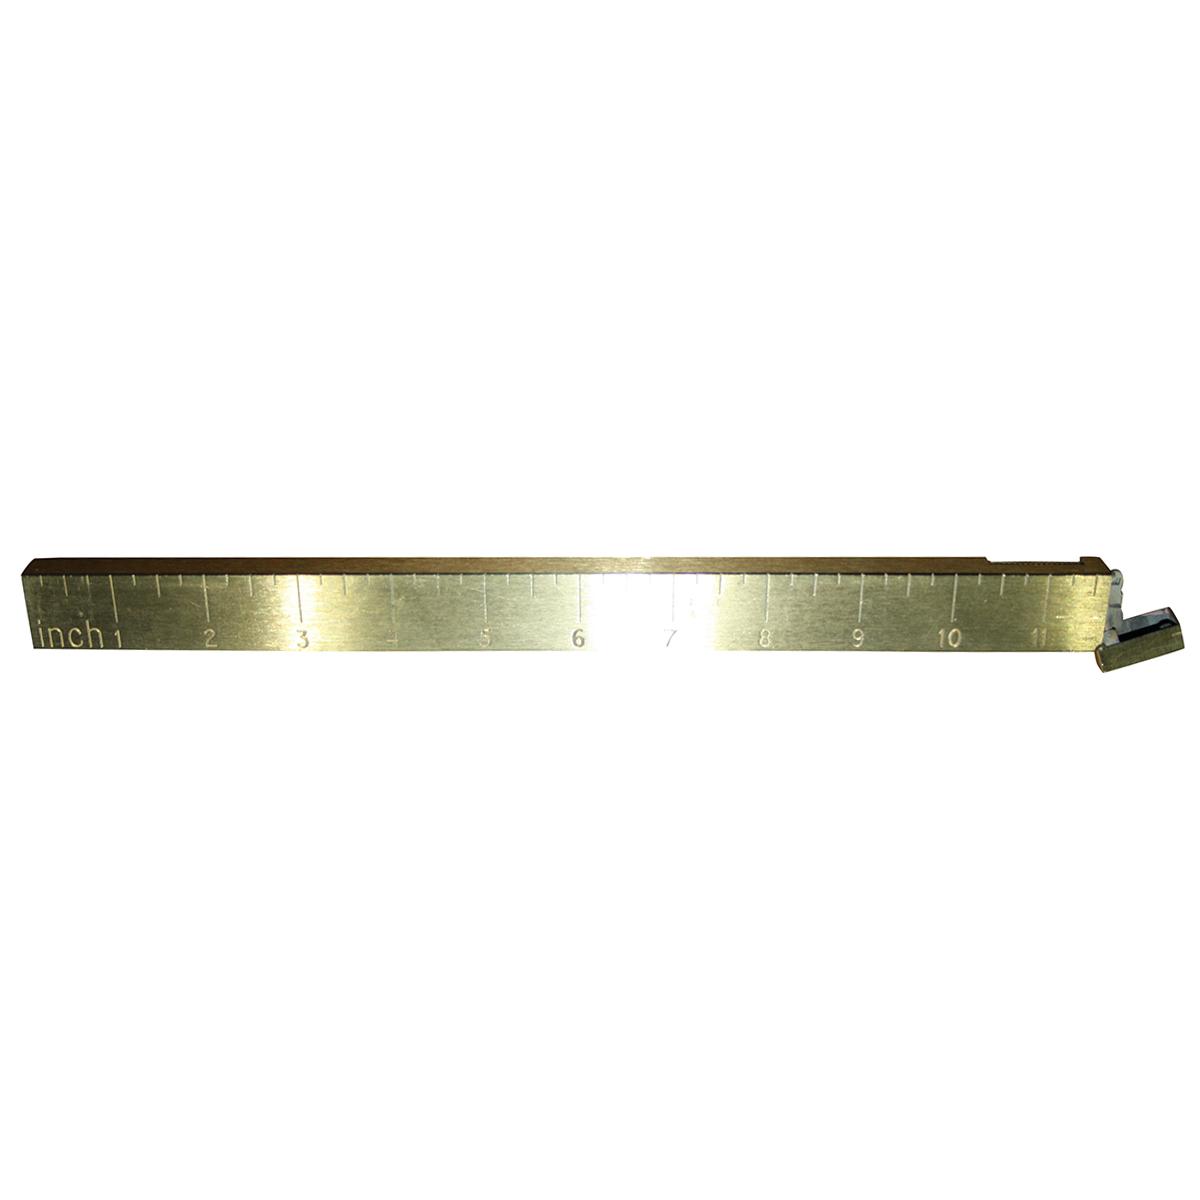 Dunhill Rare Vintage 1ft Long Ruler Table Lighter